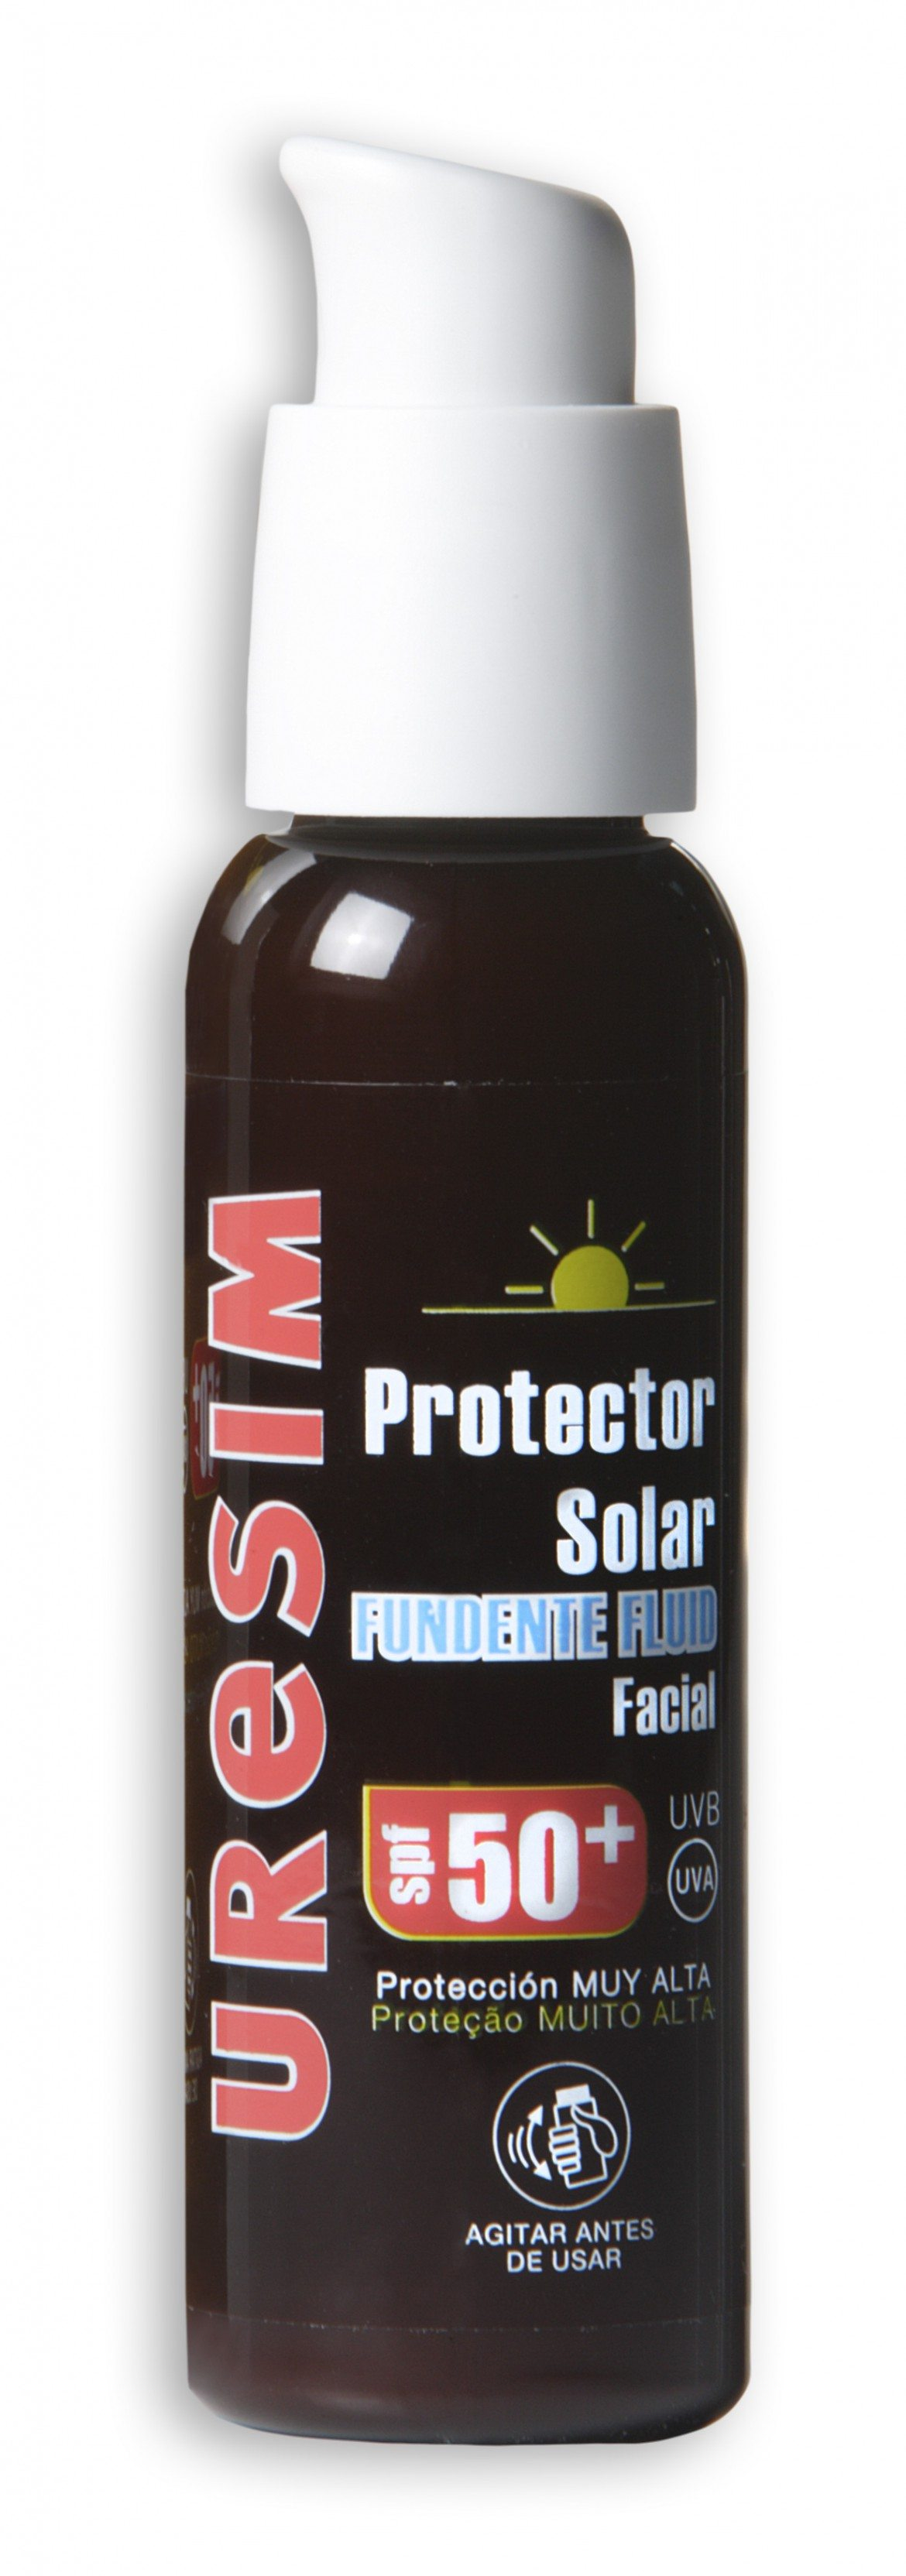 URESIM PROTECTOR SOLAR FUNDENTE FLUID 50+